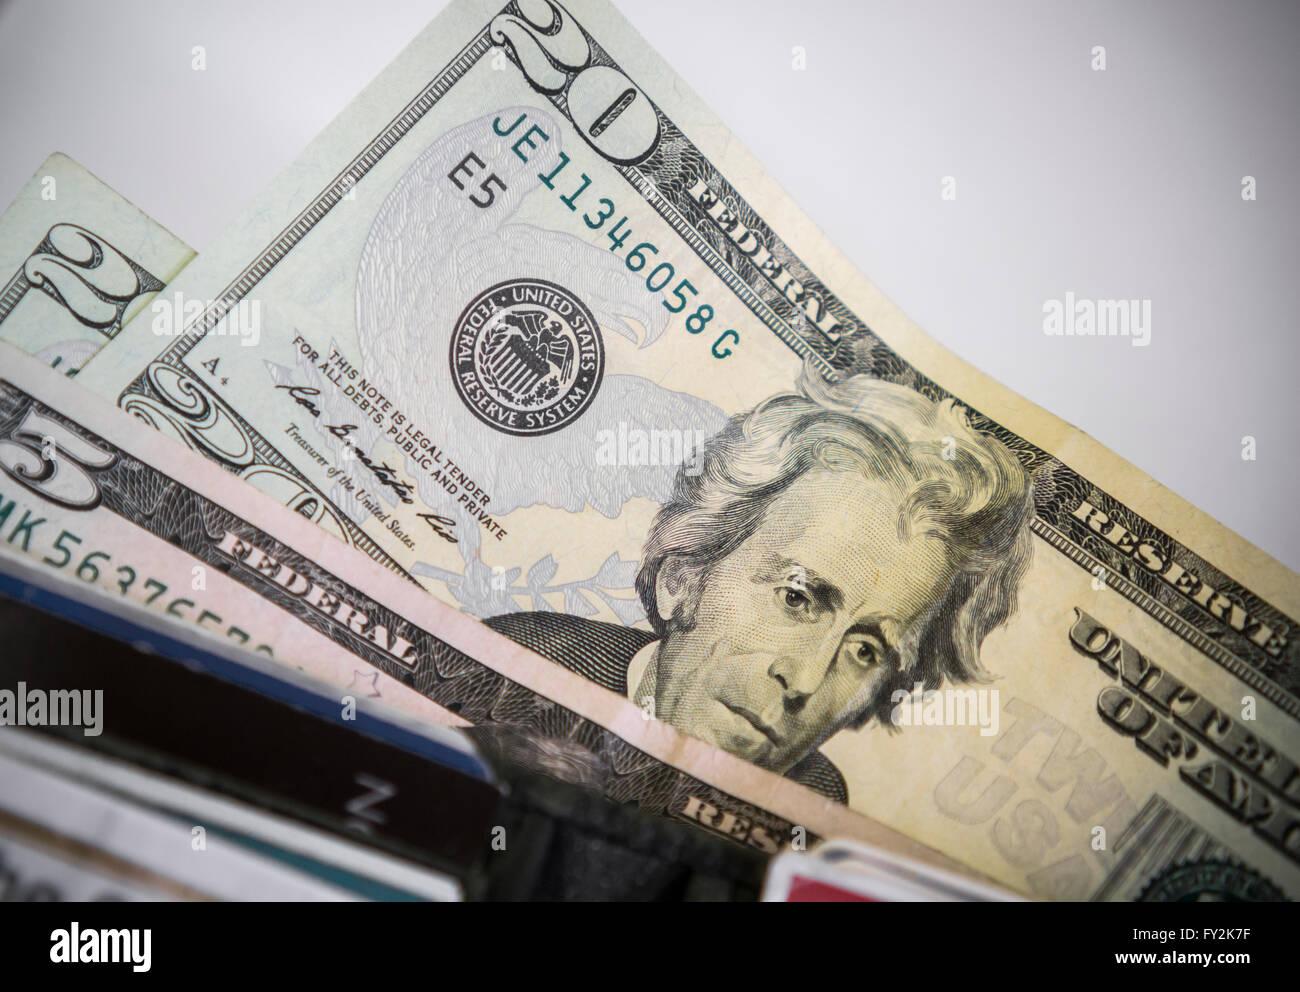 A U S  twenty dollar bill with Andrew Jackson is seen